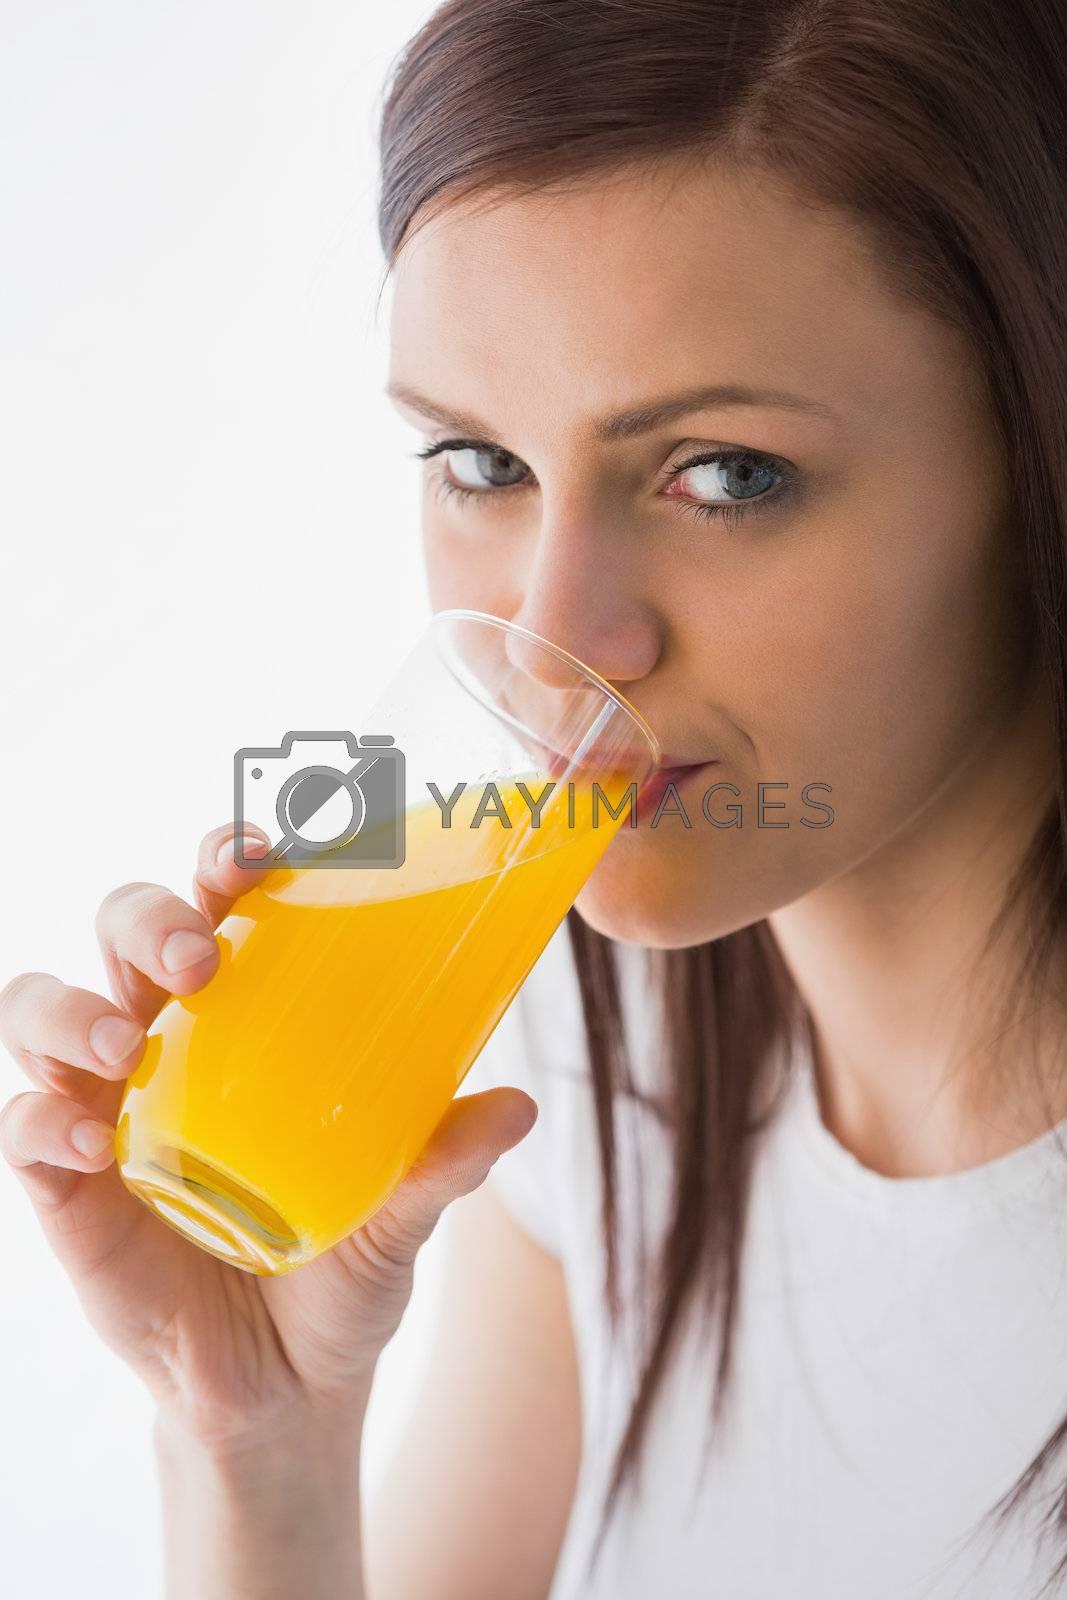 Smiling girl drinking a glass of orange juice by Wavebreakmedia